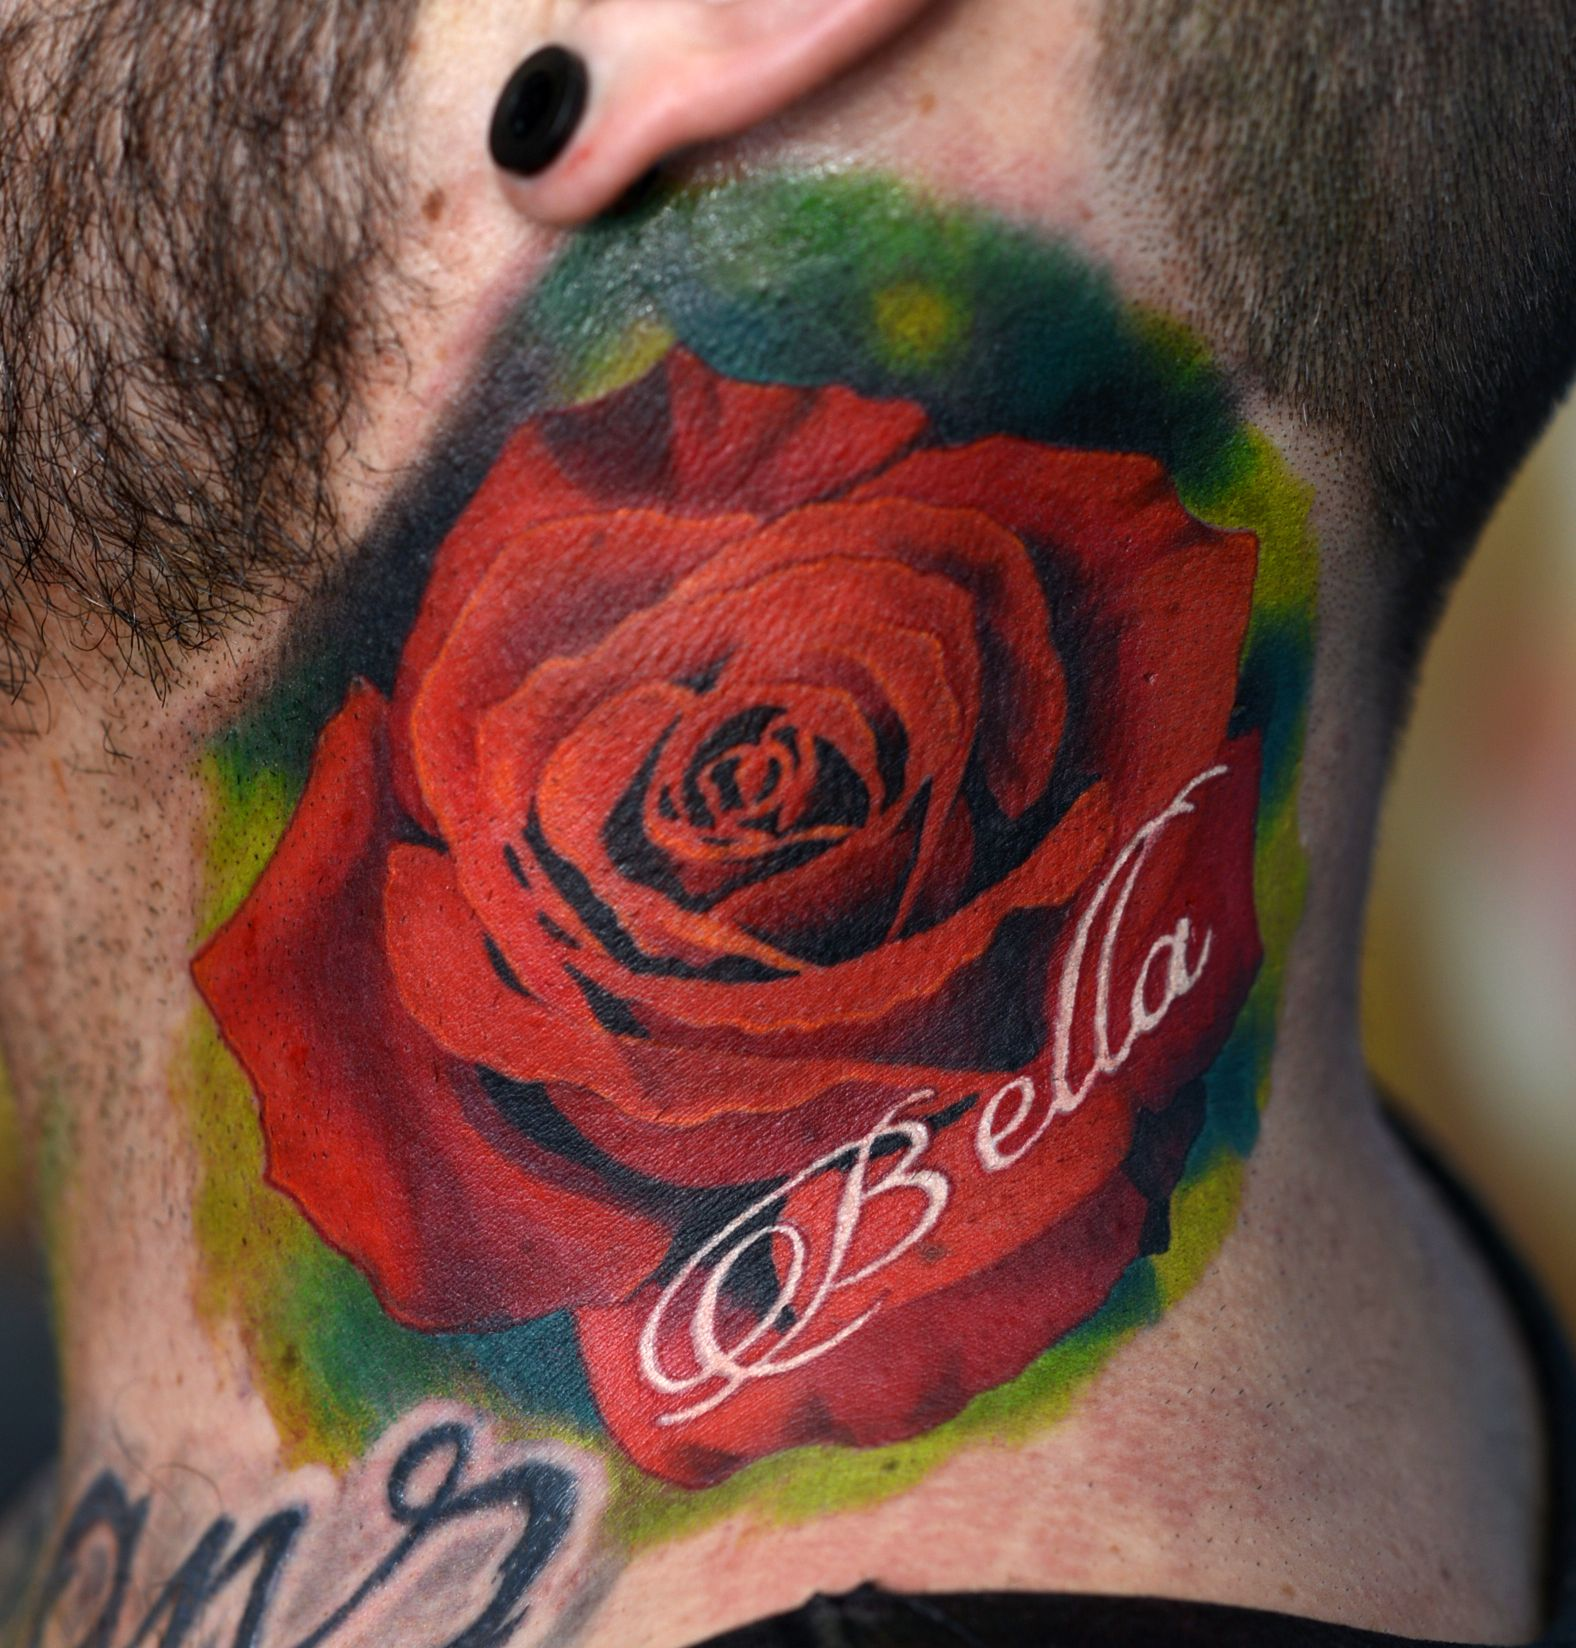 Neck Realistic Rose Tattoo Ink Red Top Ink Dublin Forever Petals City Tattoo Tattoo Dublin Custom Tattoo Design